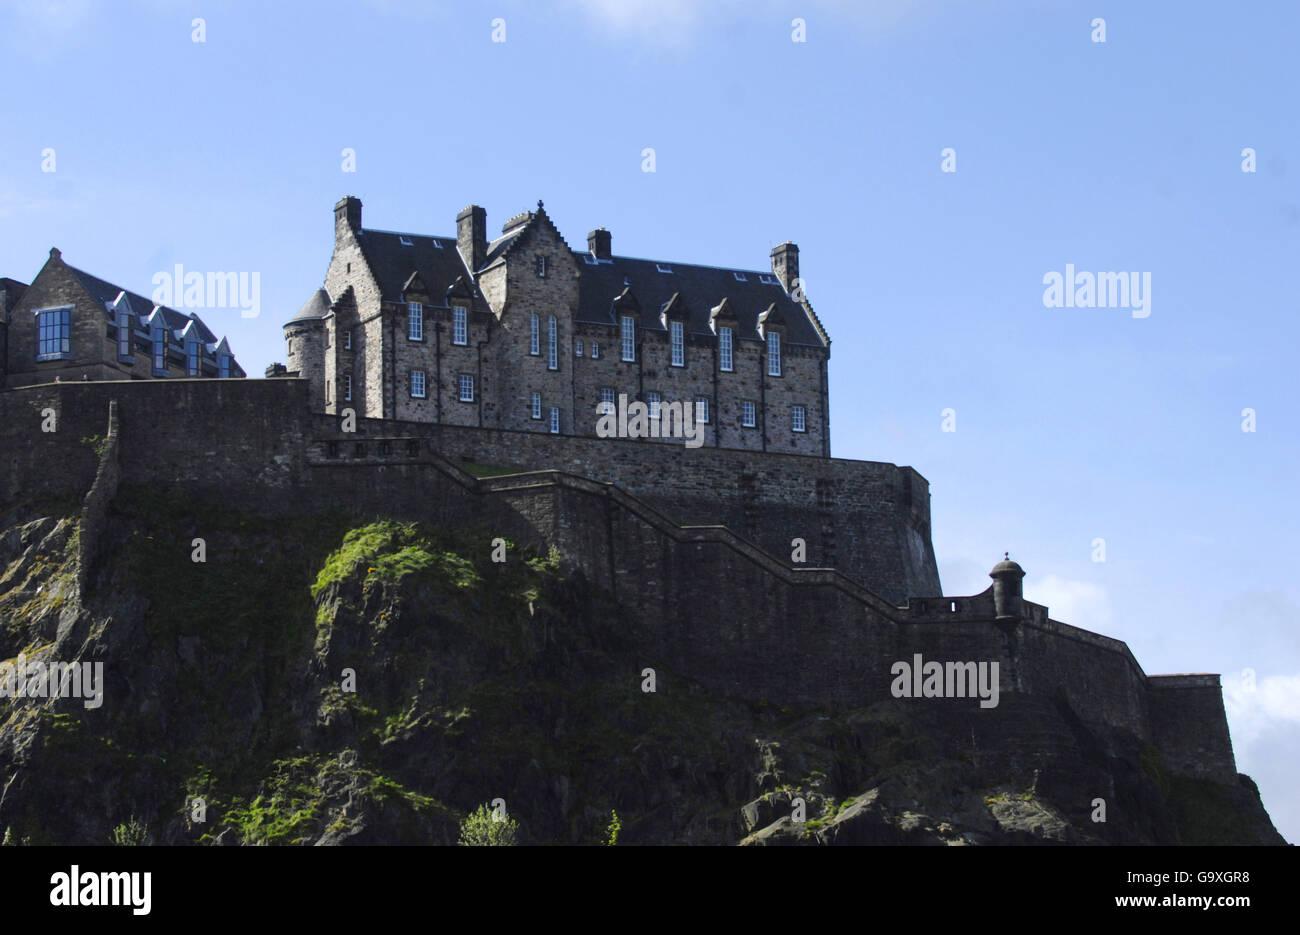 Edinburgh Castle - Scotland - Stock Image